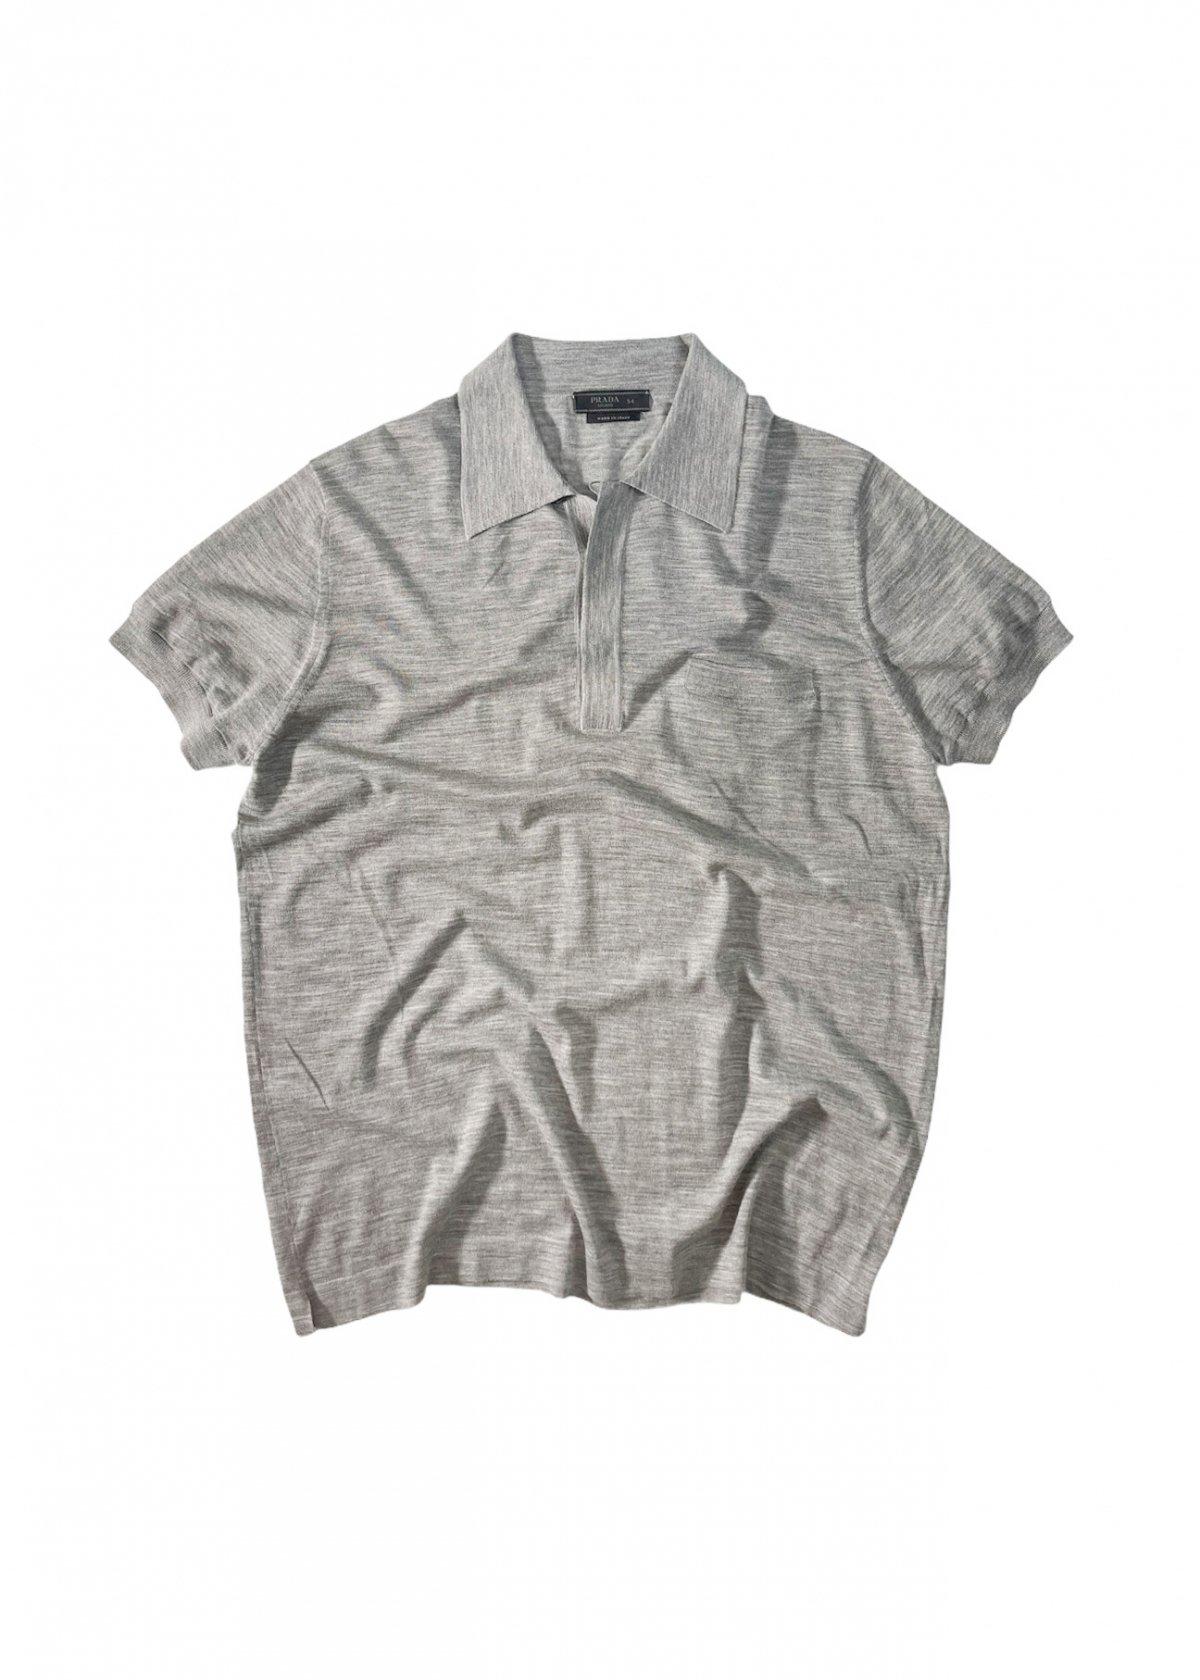 PRADA S/S Knit Polo Shirt